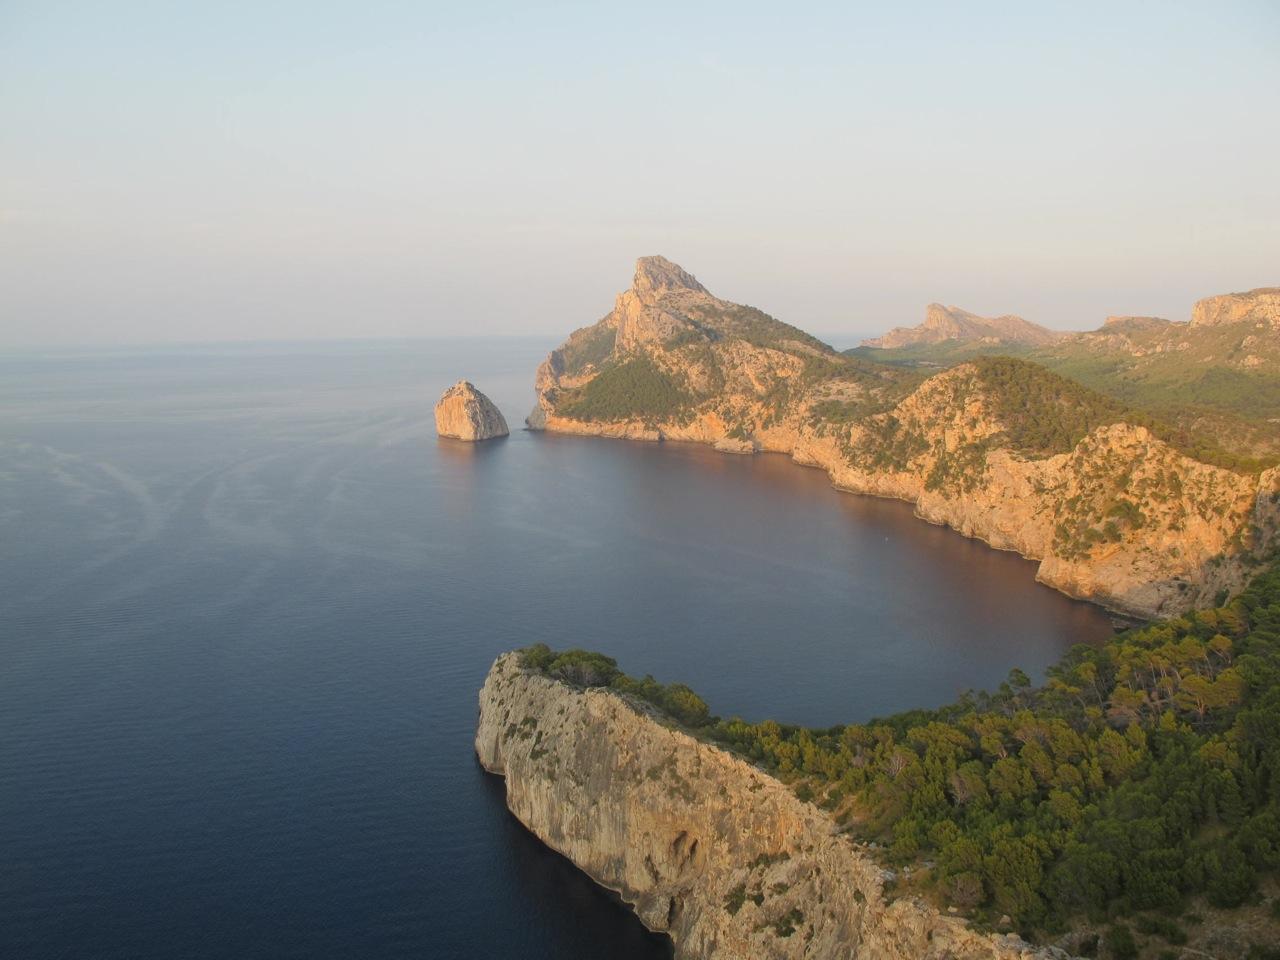 beliebtes Reise-Ziel: Mallorca